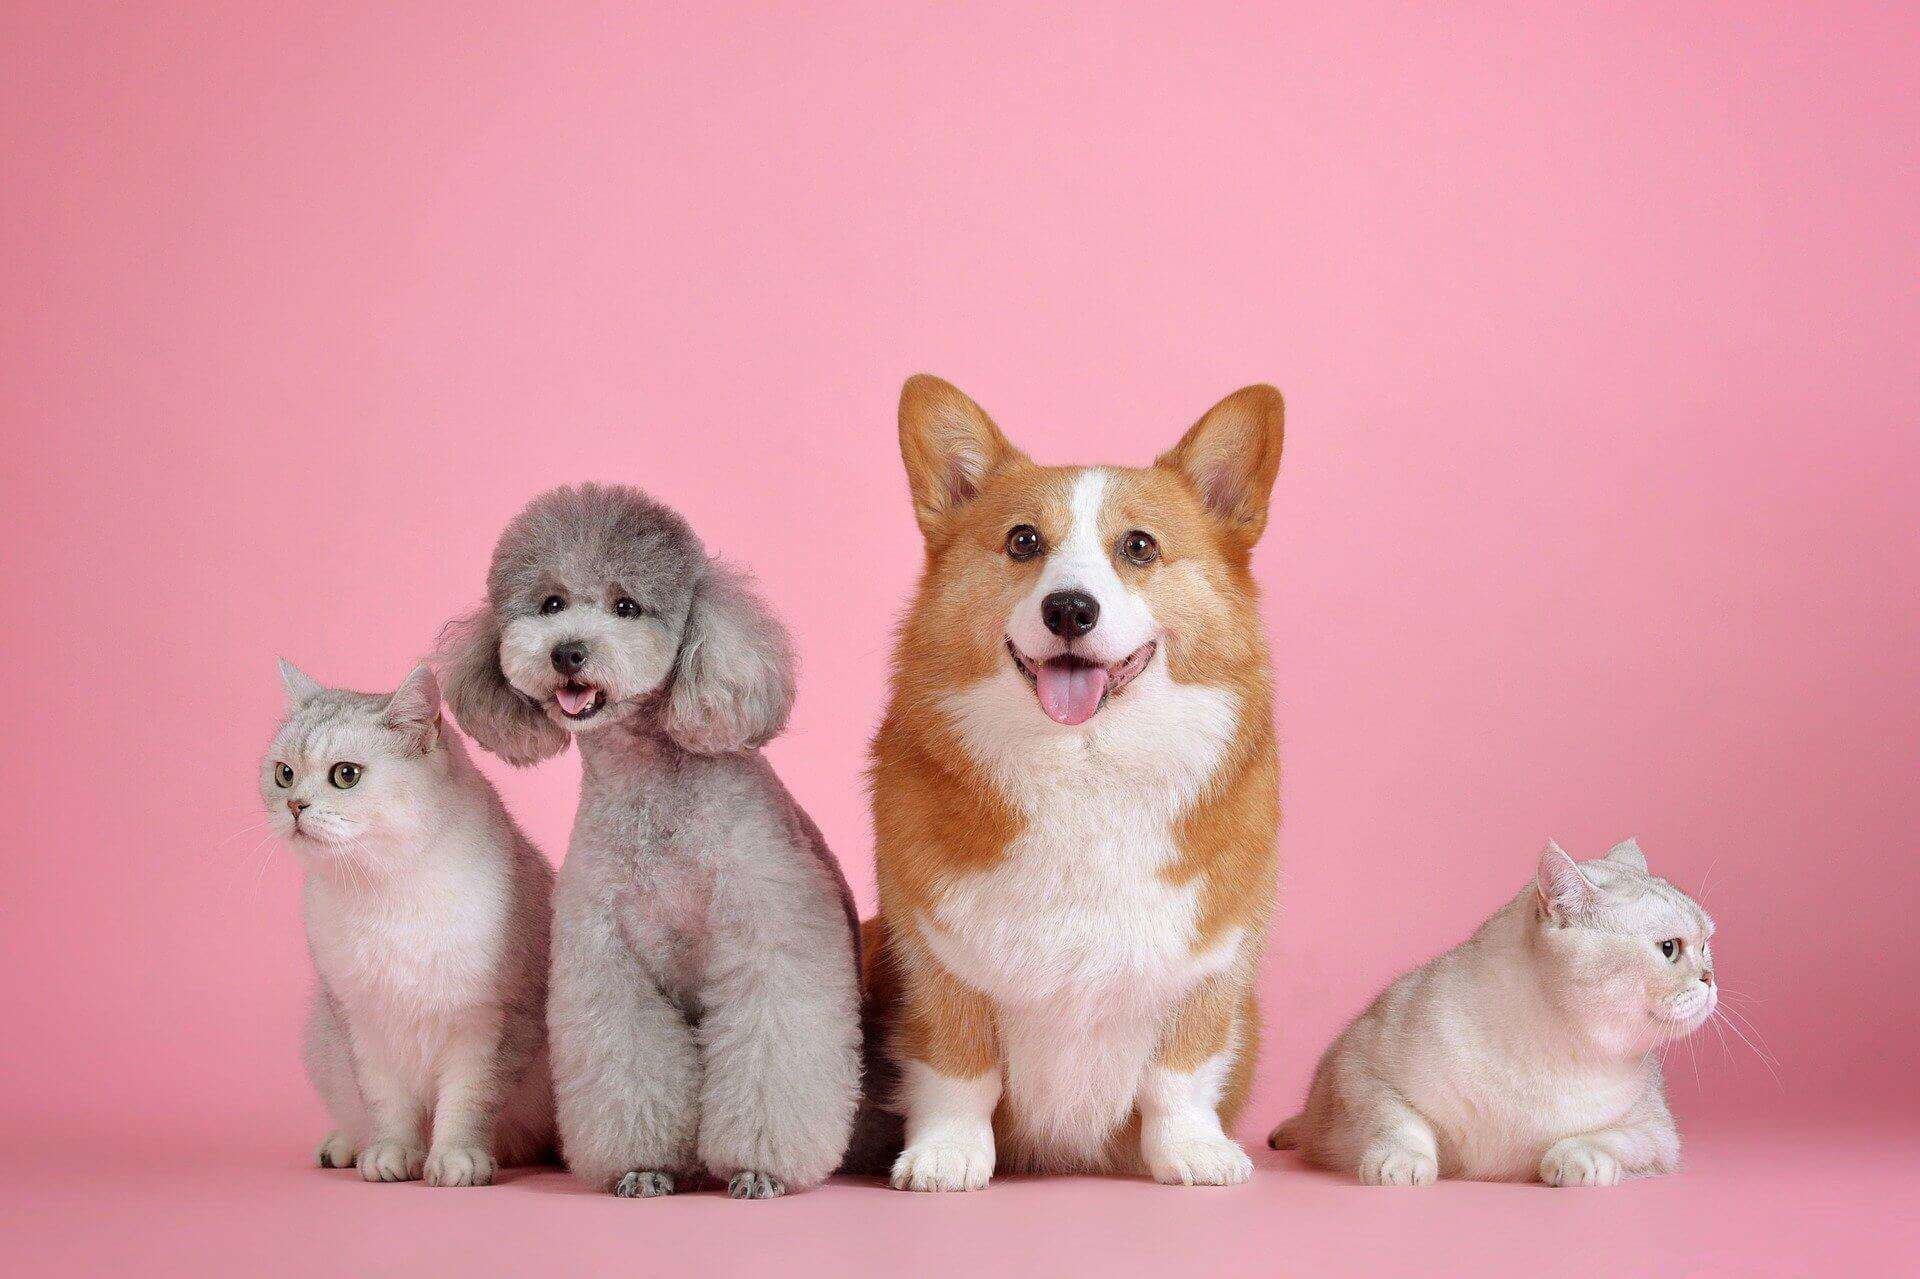 vertragen sich eure hunde mit anderen haus tieren